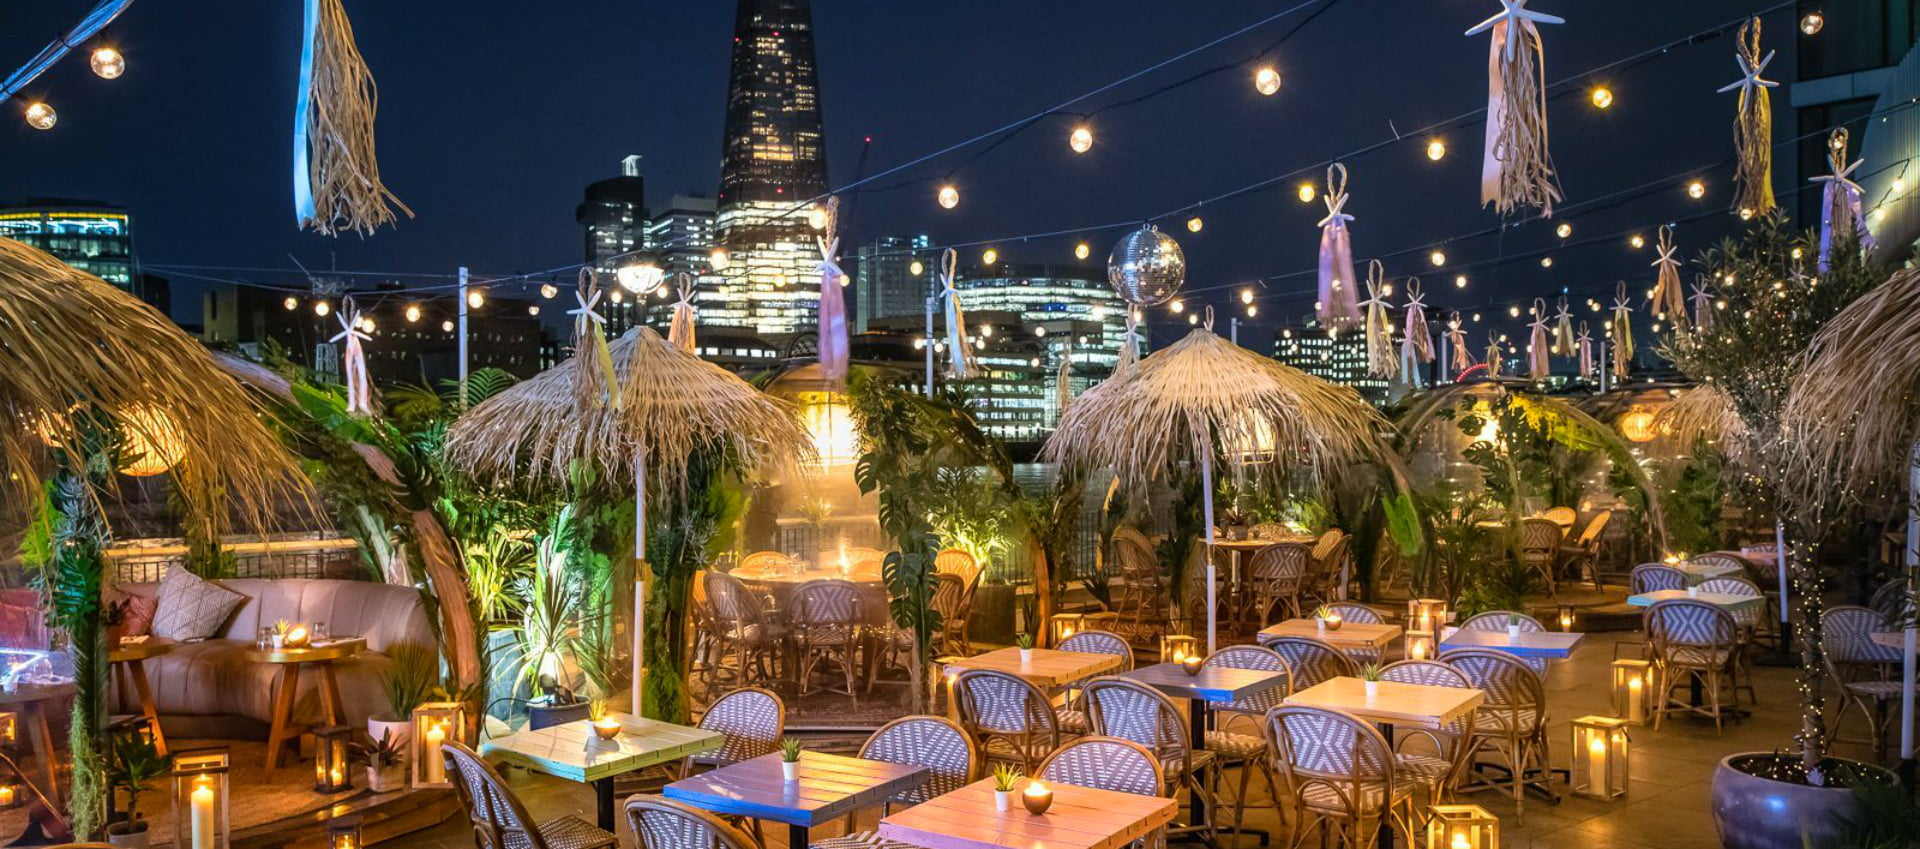 Coppa Club Tower Bridge Coppa Club London Dine In A